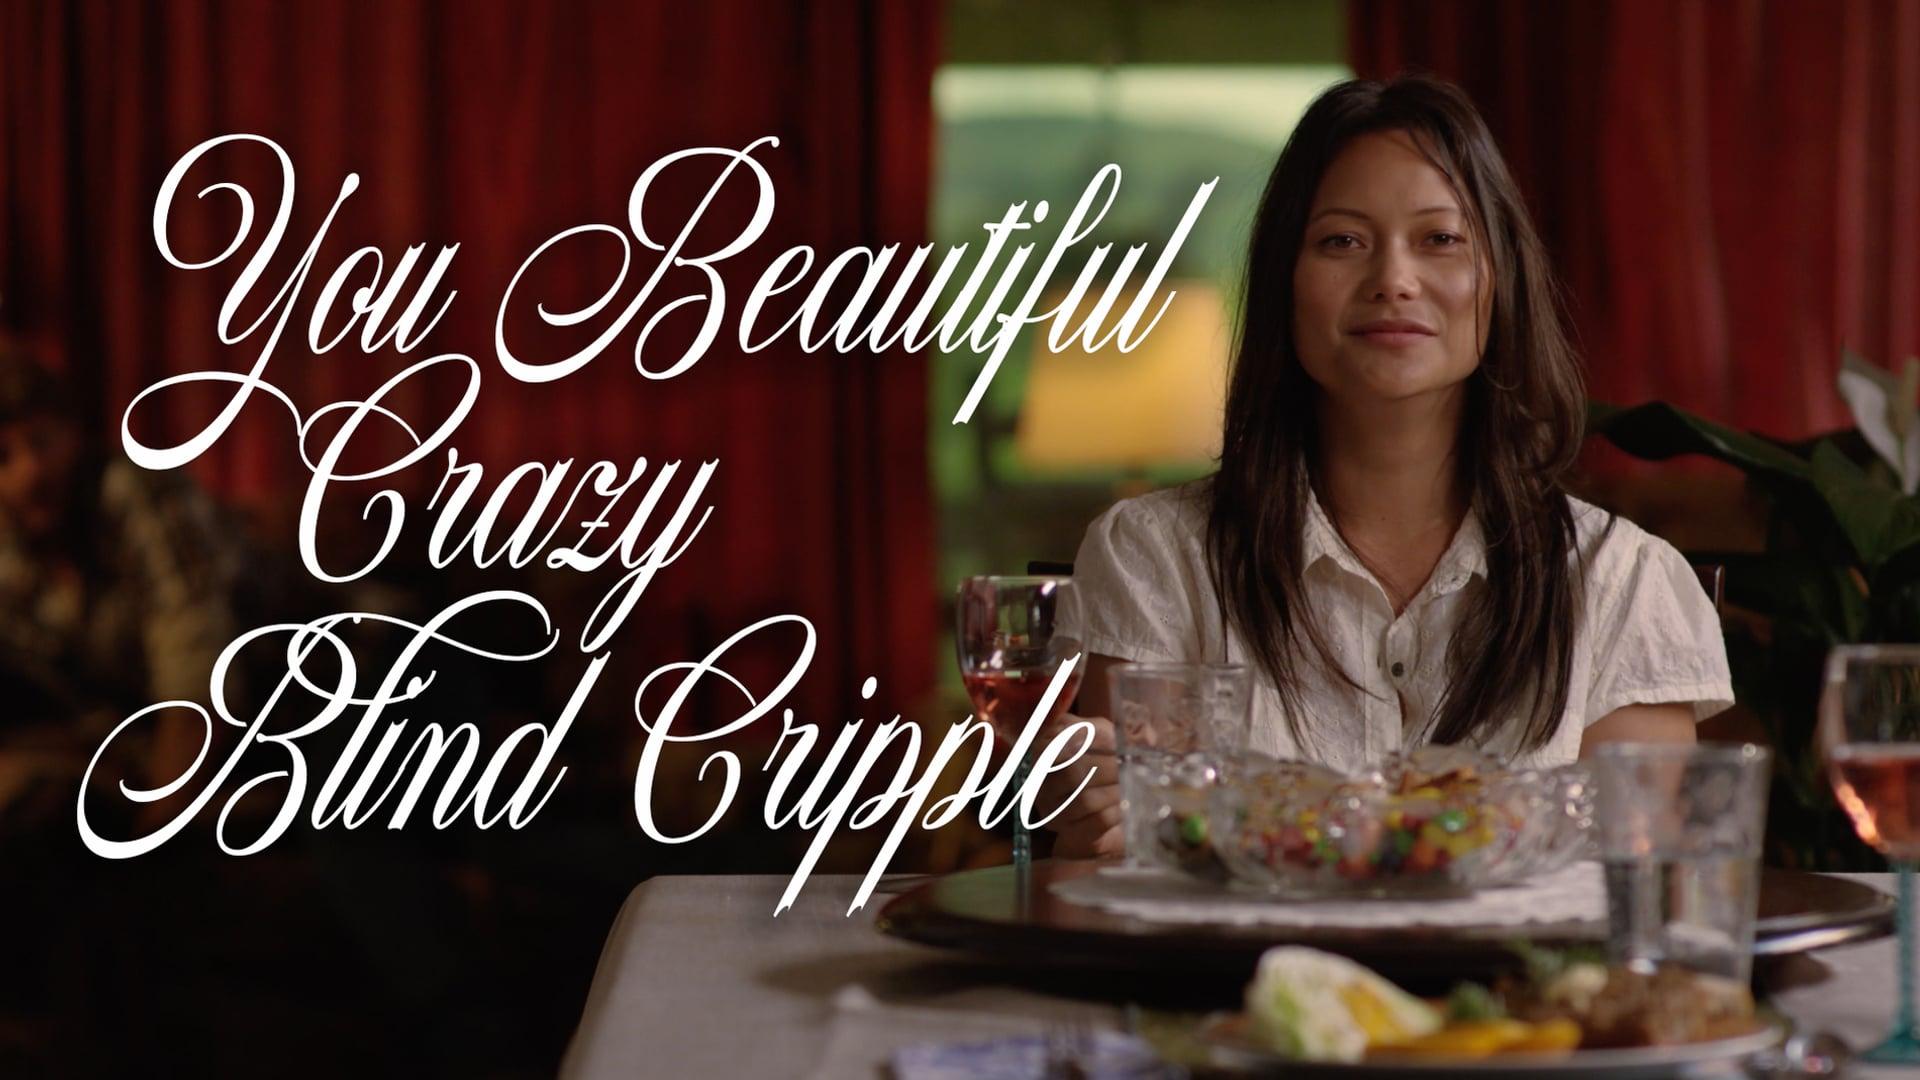 You Beautiful Crazy Blind Cripple